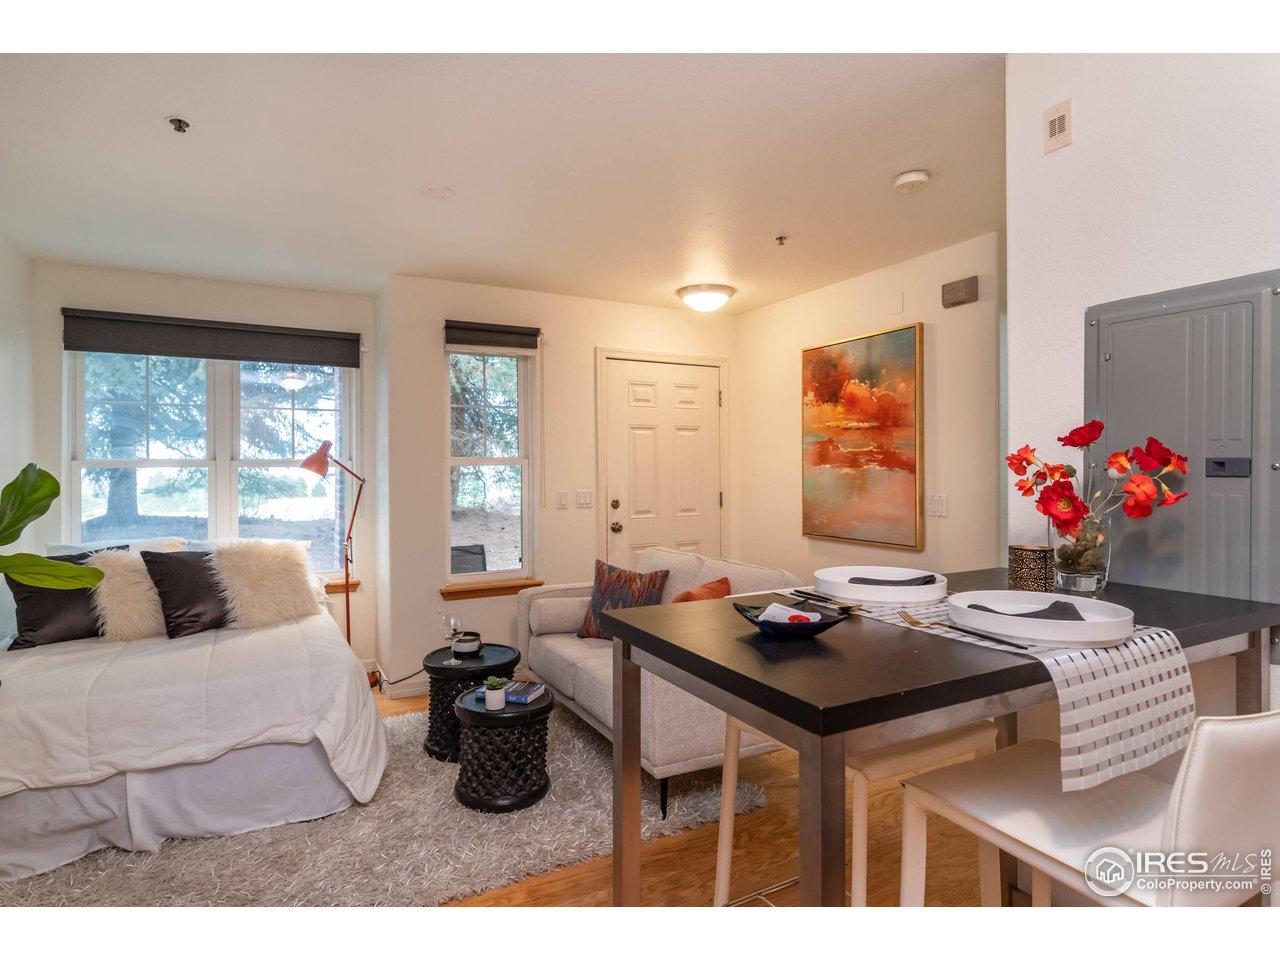 Open Floor Plan w/ No Defining Walls & High Ceilings